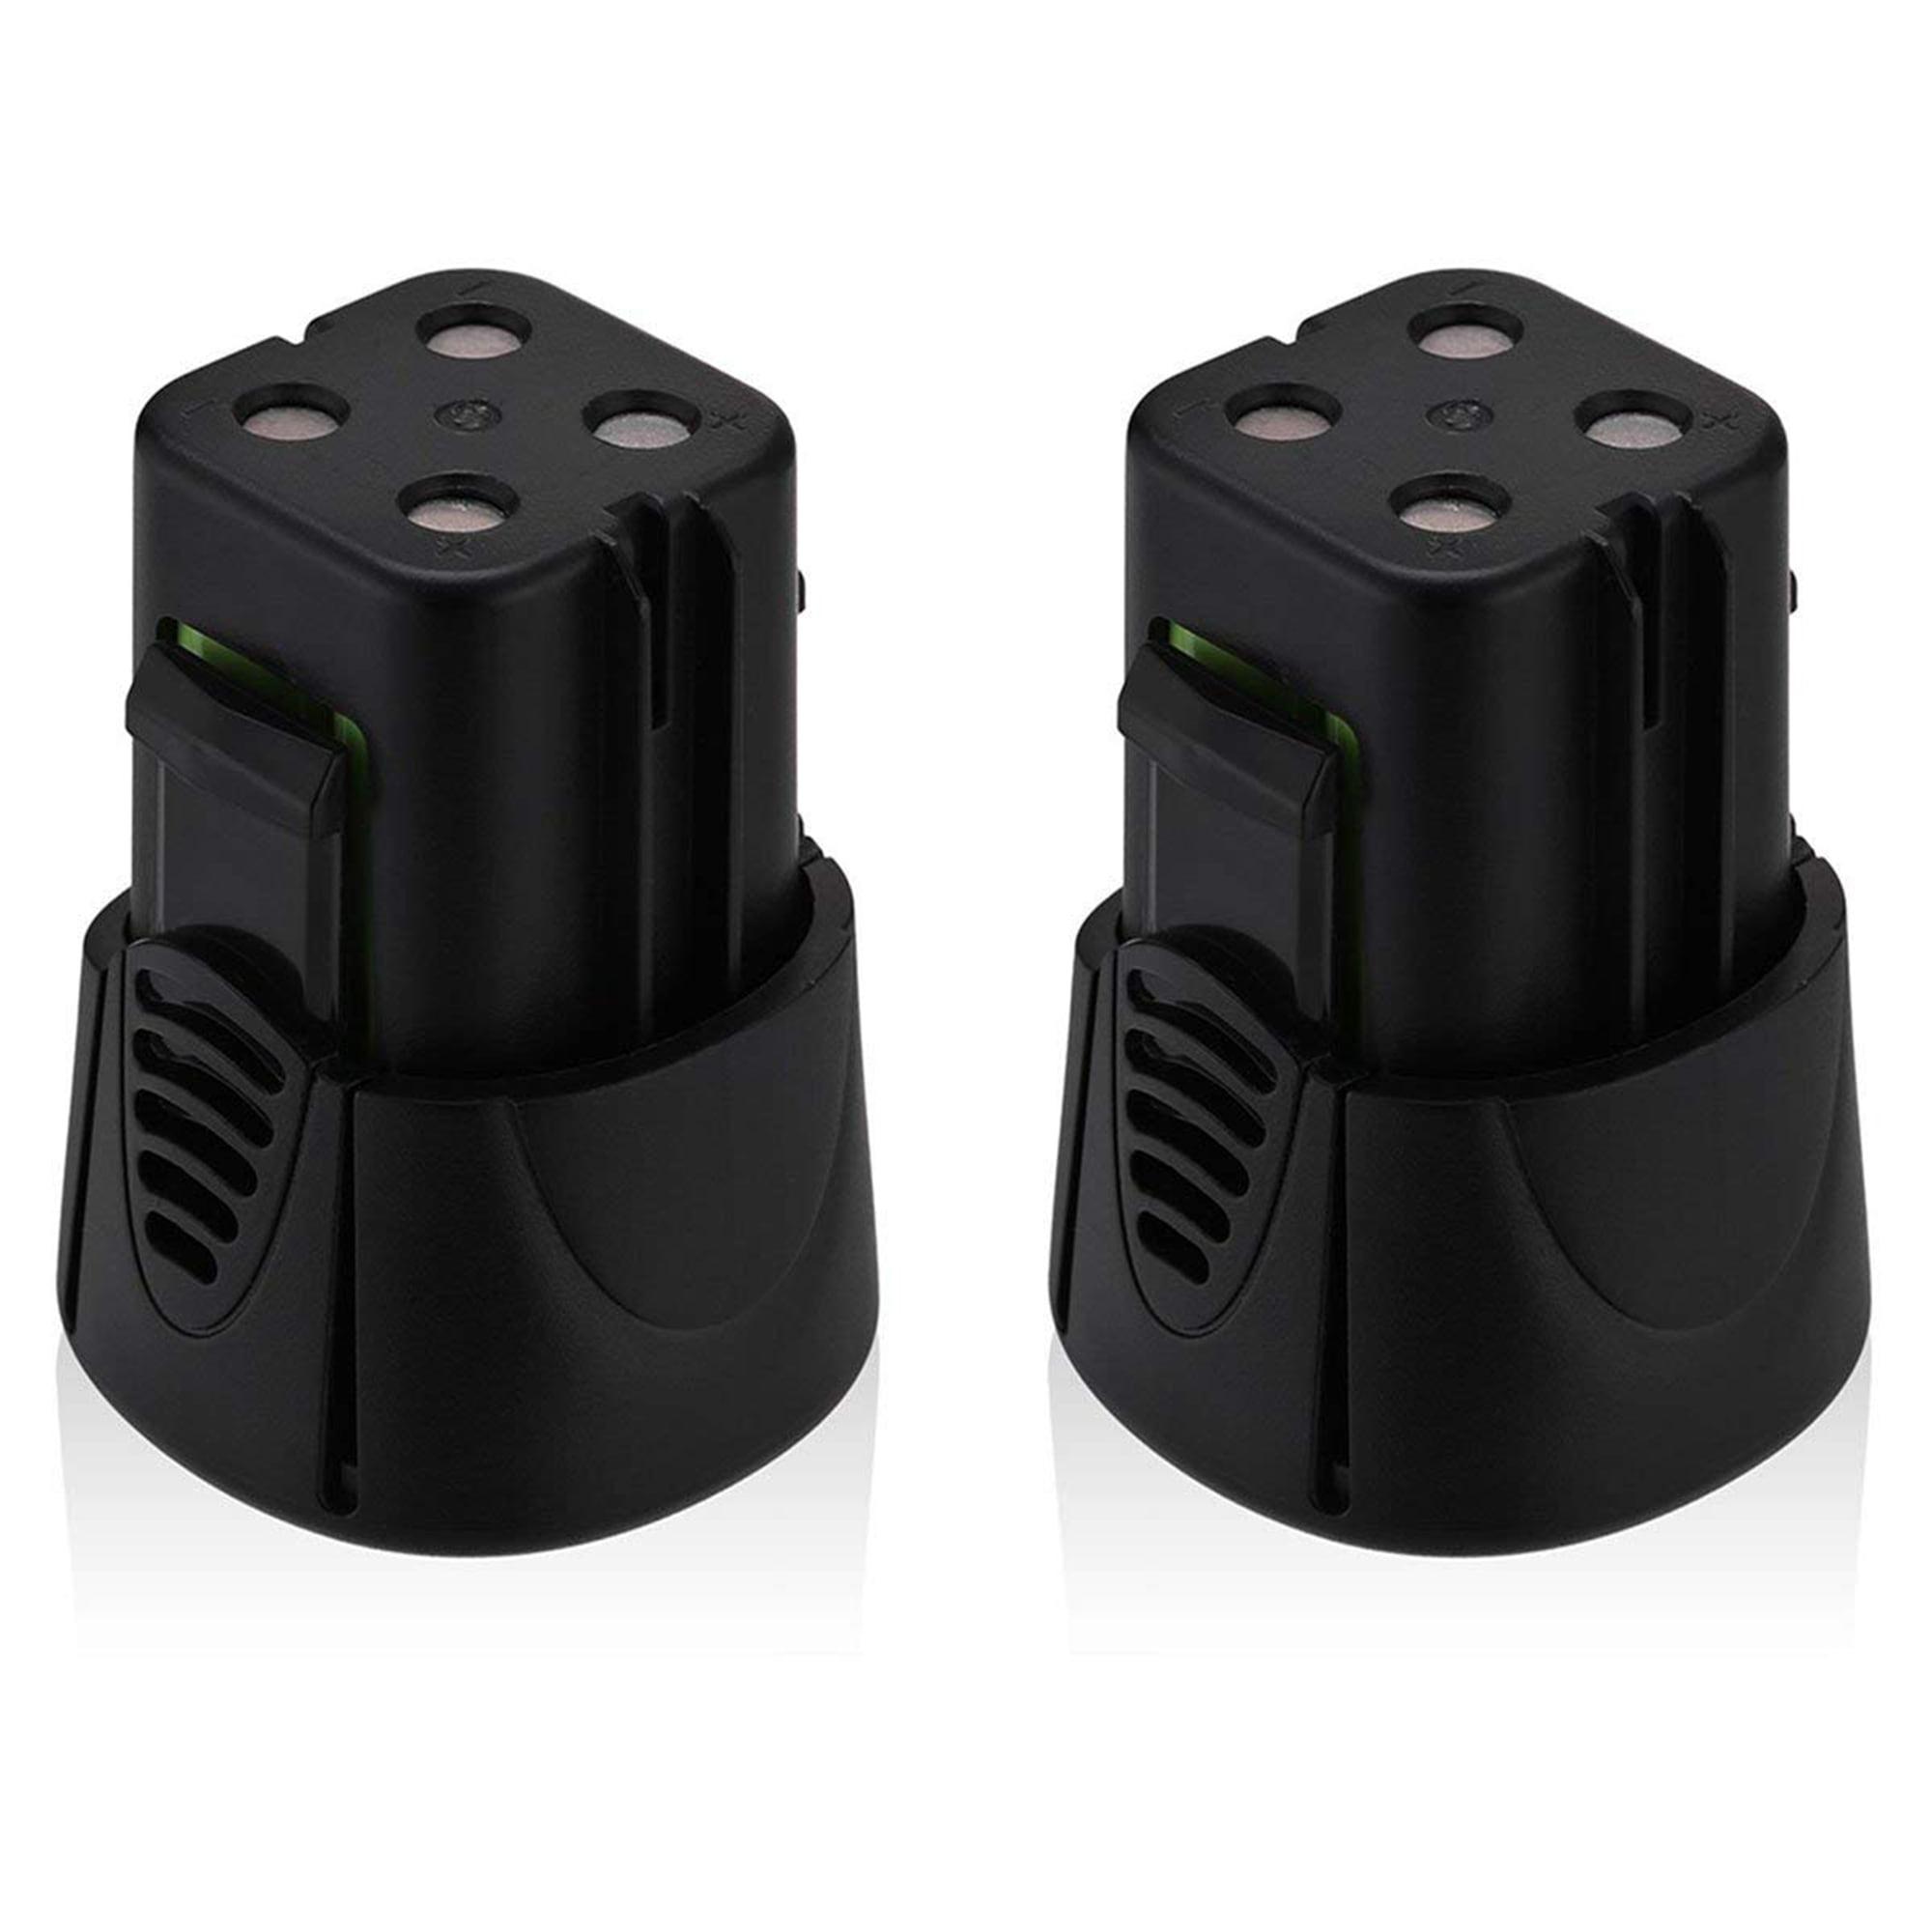 Powerextra 2 Pack 4 8v 3000mah Replacement Battery For Dremel 7300 755 01 Minimite Dremel Power